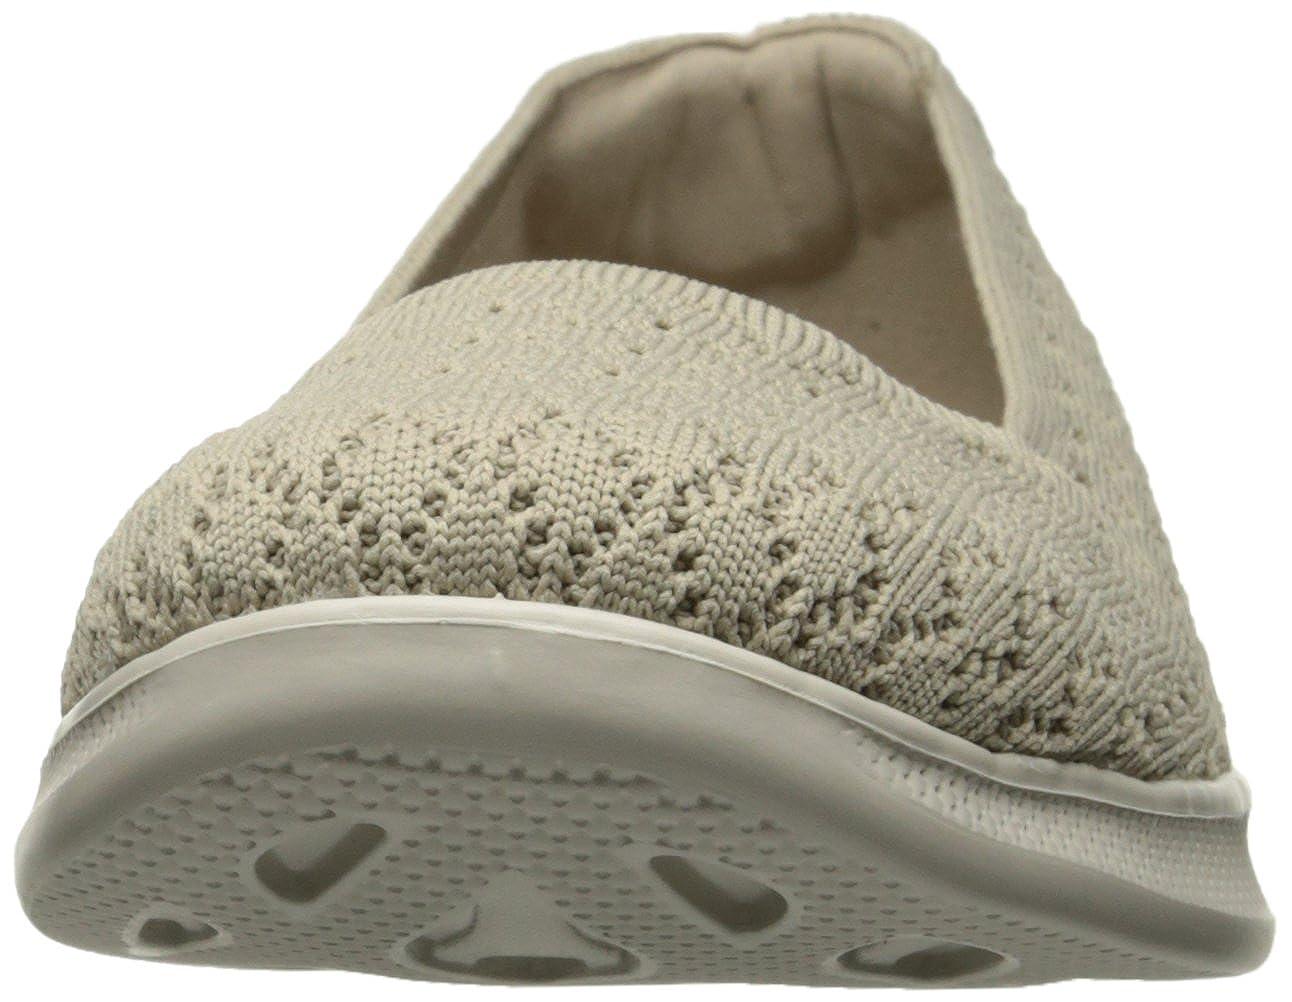 Skechers Womens Go Step Lite-Wander Walking Shoe Taupe 9 M US 14743